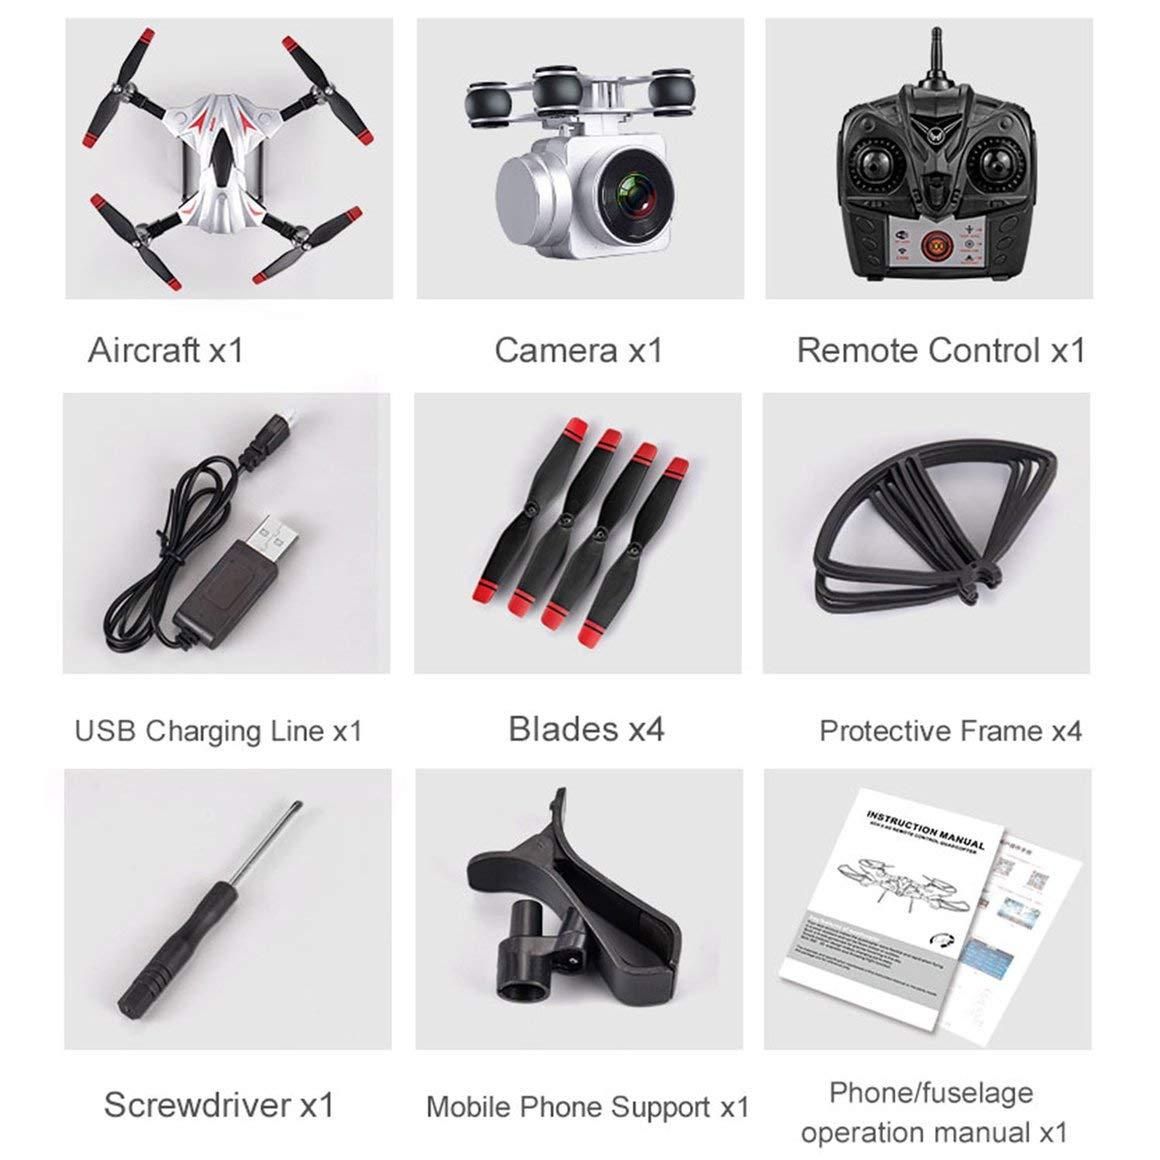 Funnyrunstore S13 Full HD 1080P Telecamera 4 canali 6 Assi a Lunga Durata Telecomando Quadcopter Camera Drone Sistema di Posizionamento Aereo (argentoo)